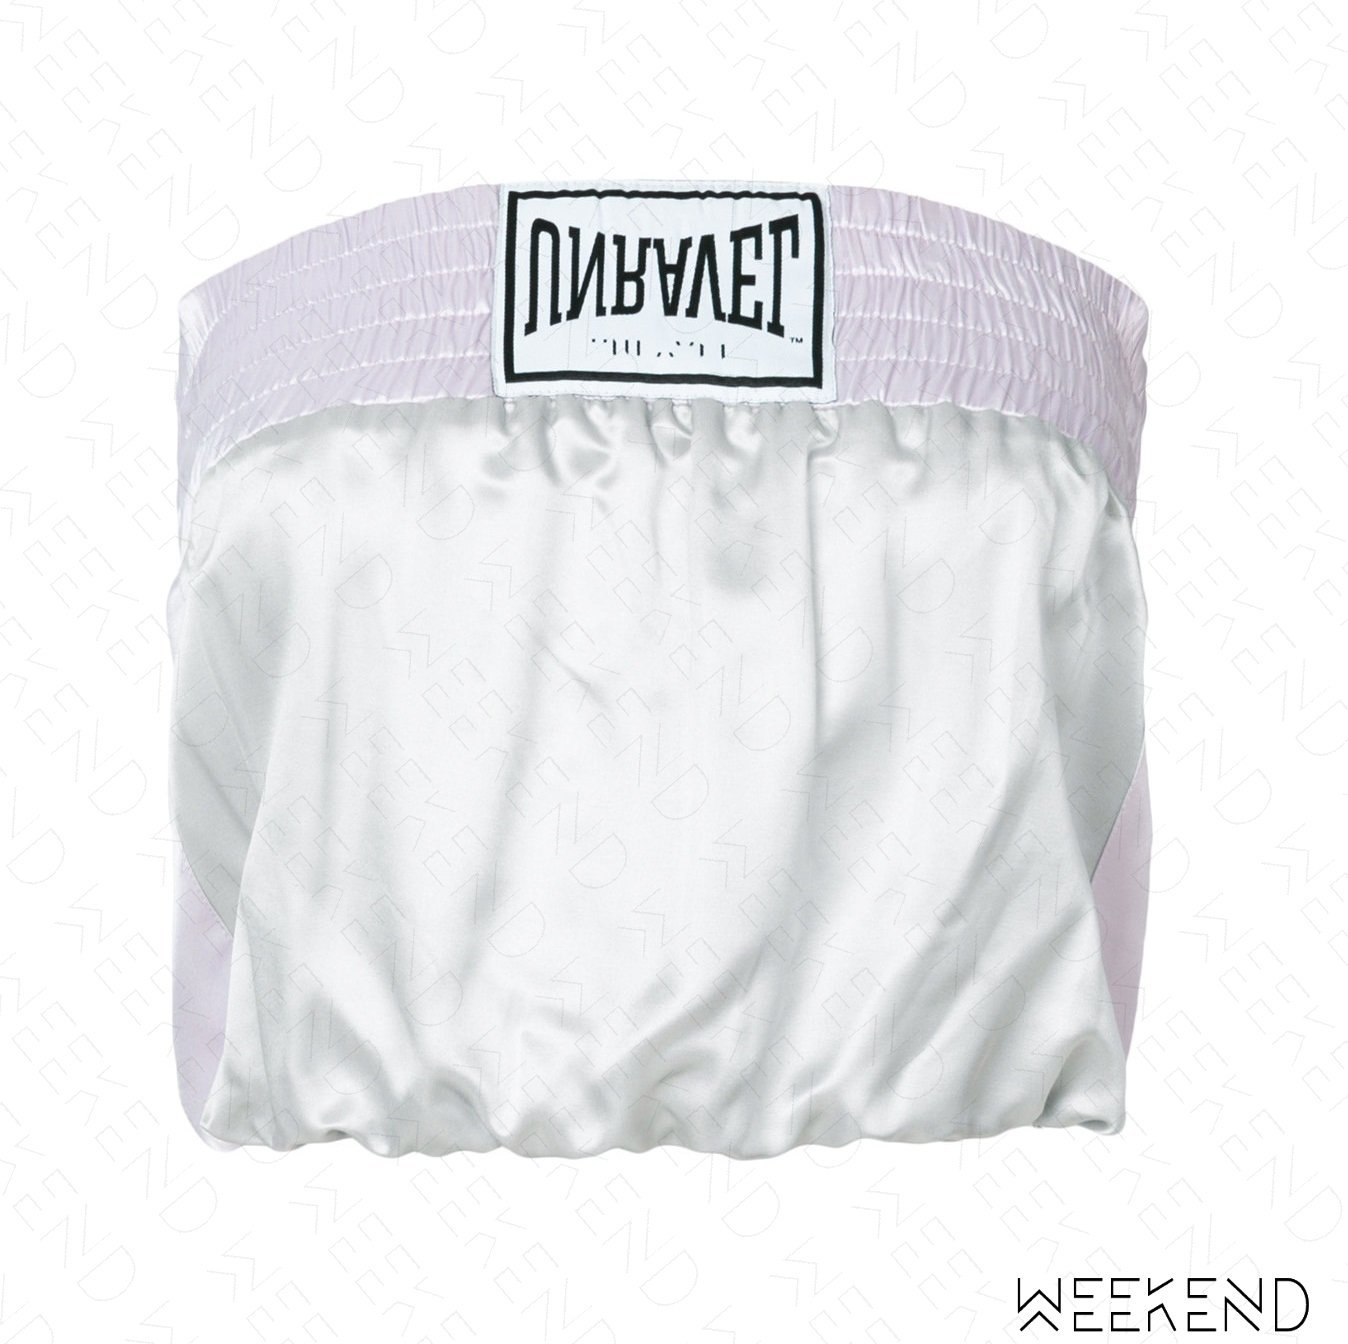 【WEEKEND】 UNRAVEL Logo 平口 上衣 淺灰色 18春夏新款